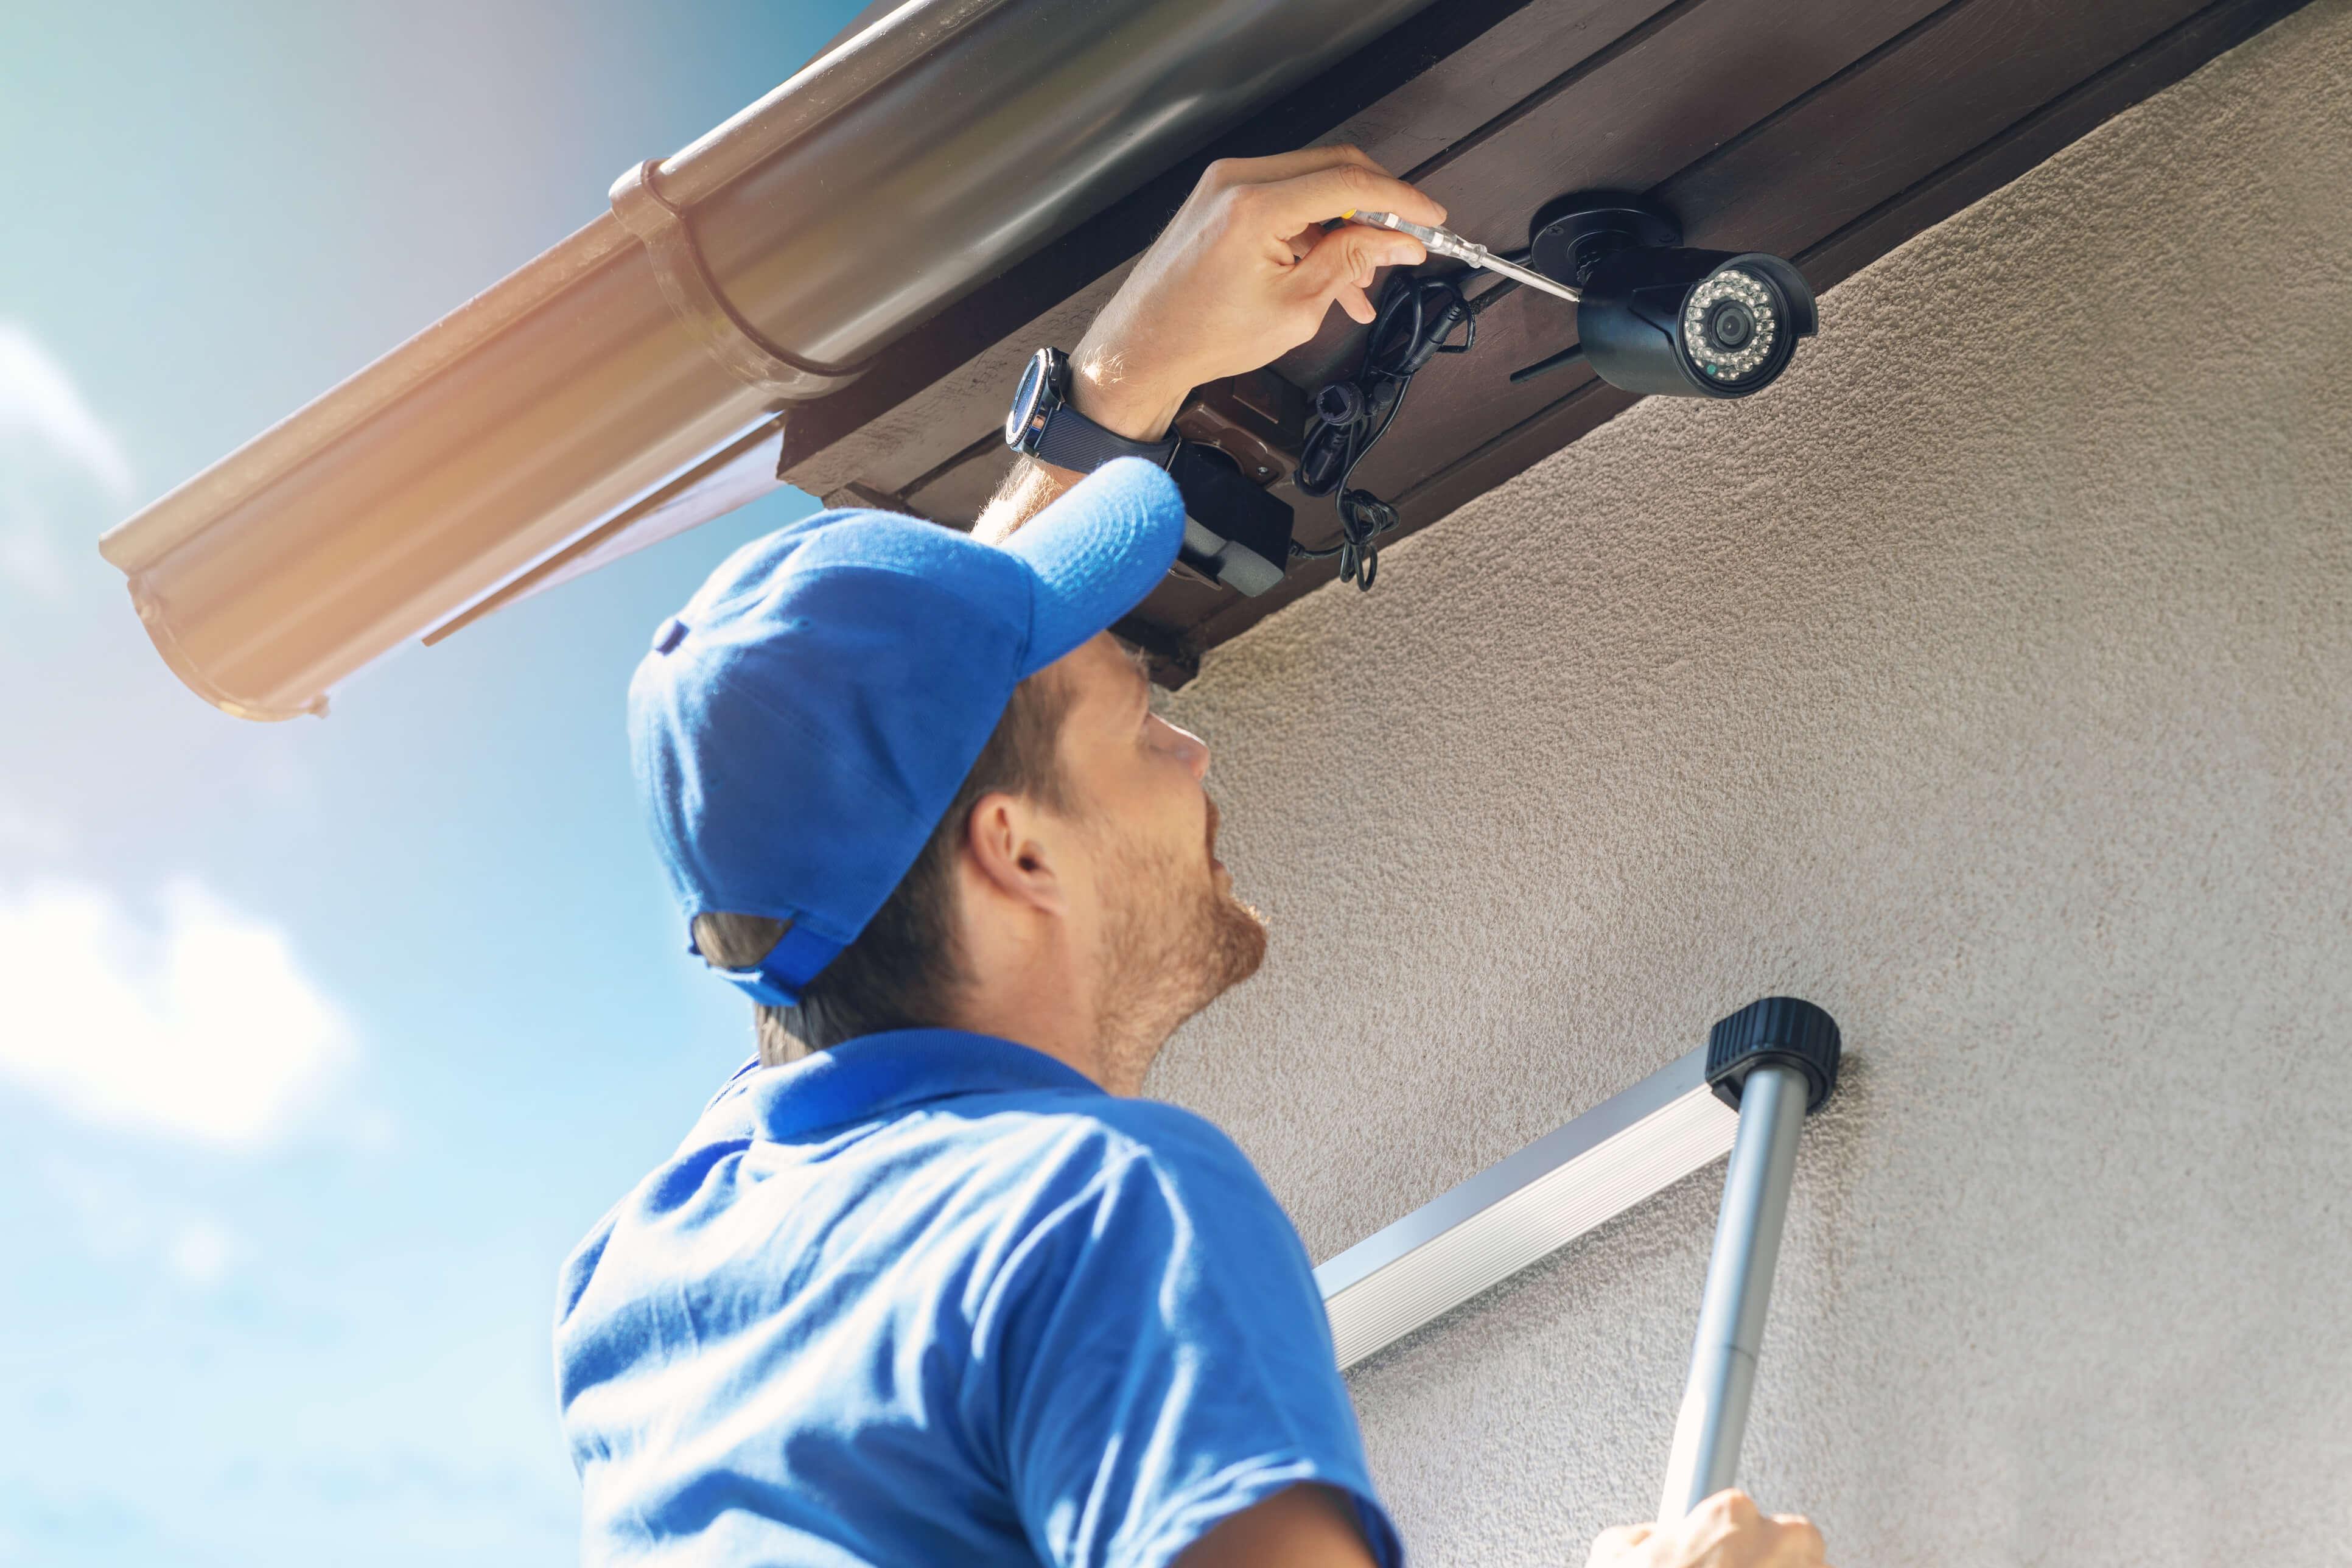 Turnip technician installing smart home security camera.